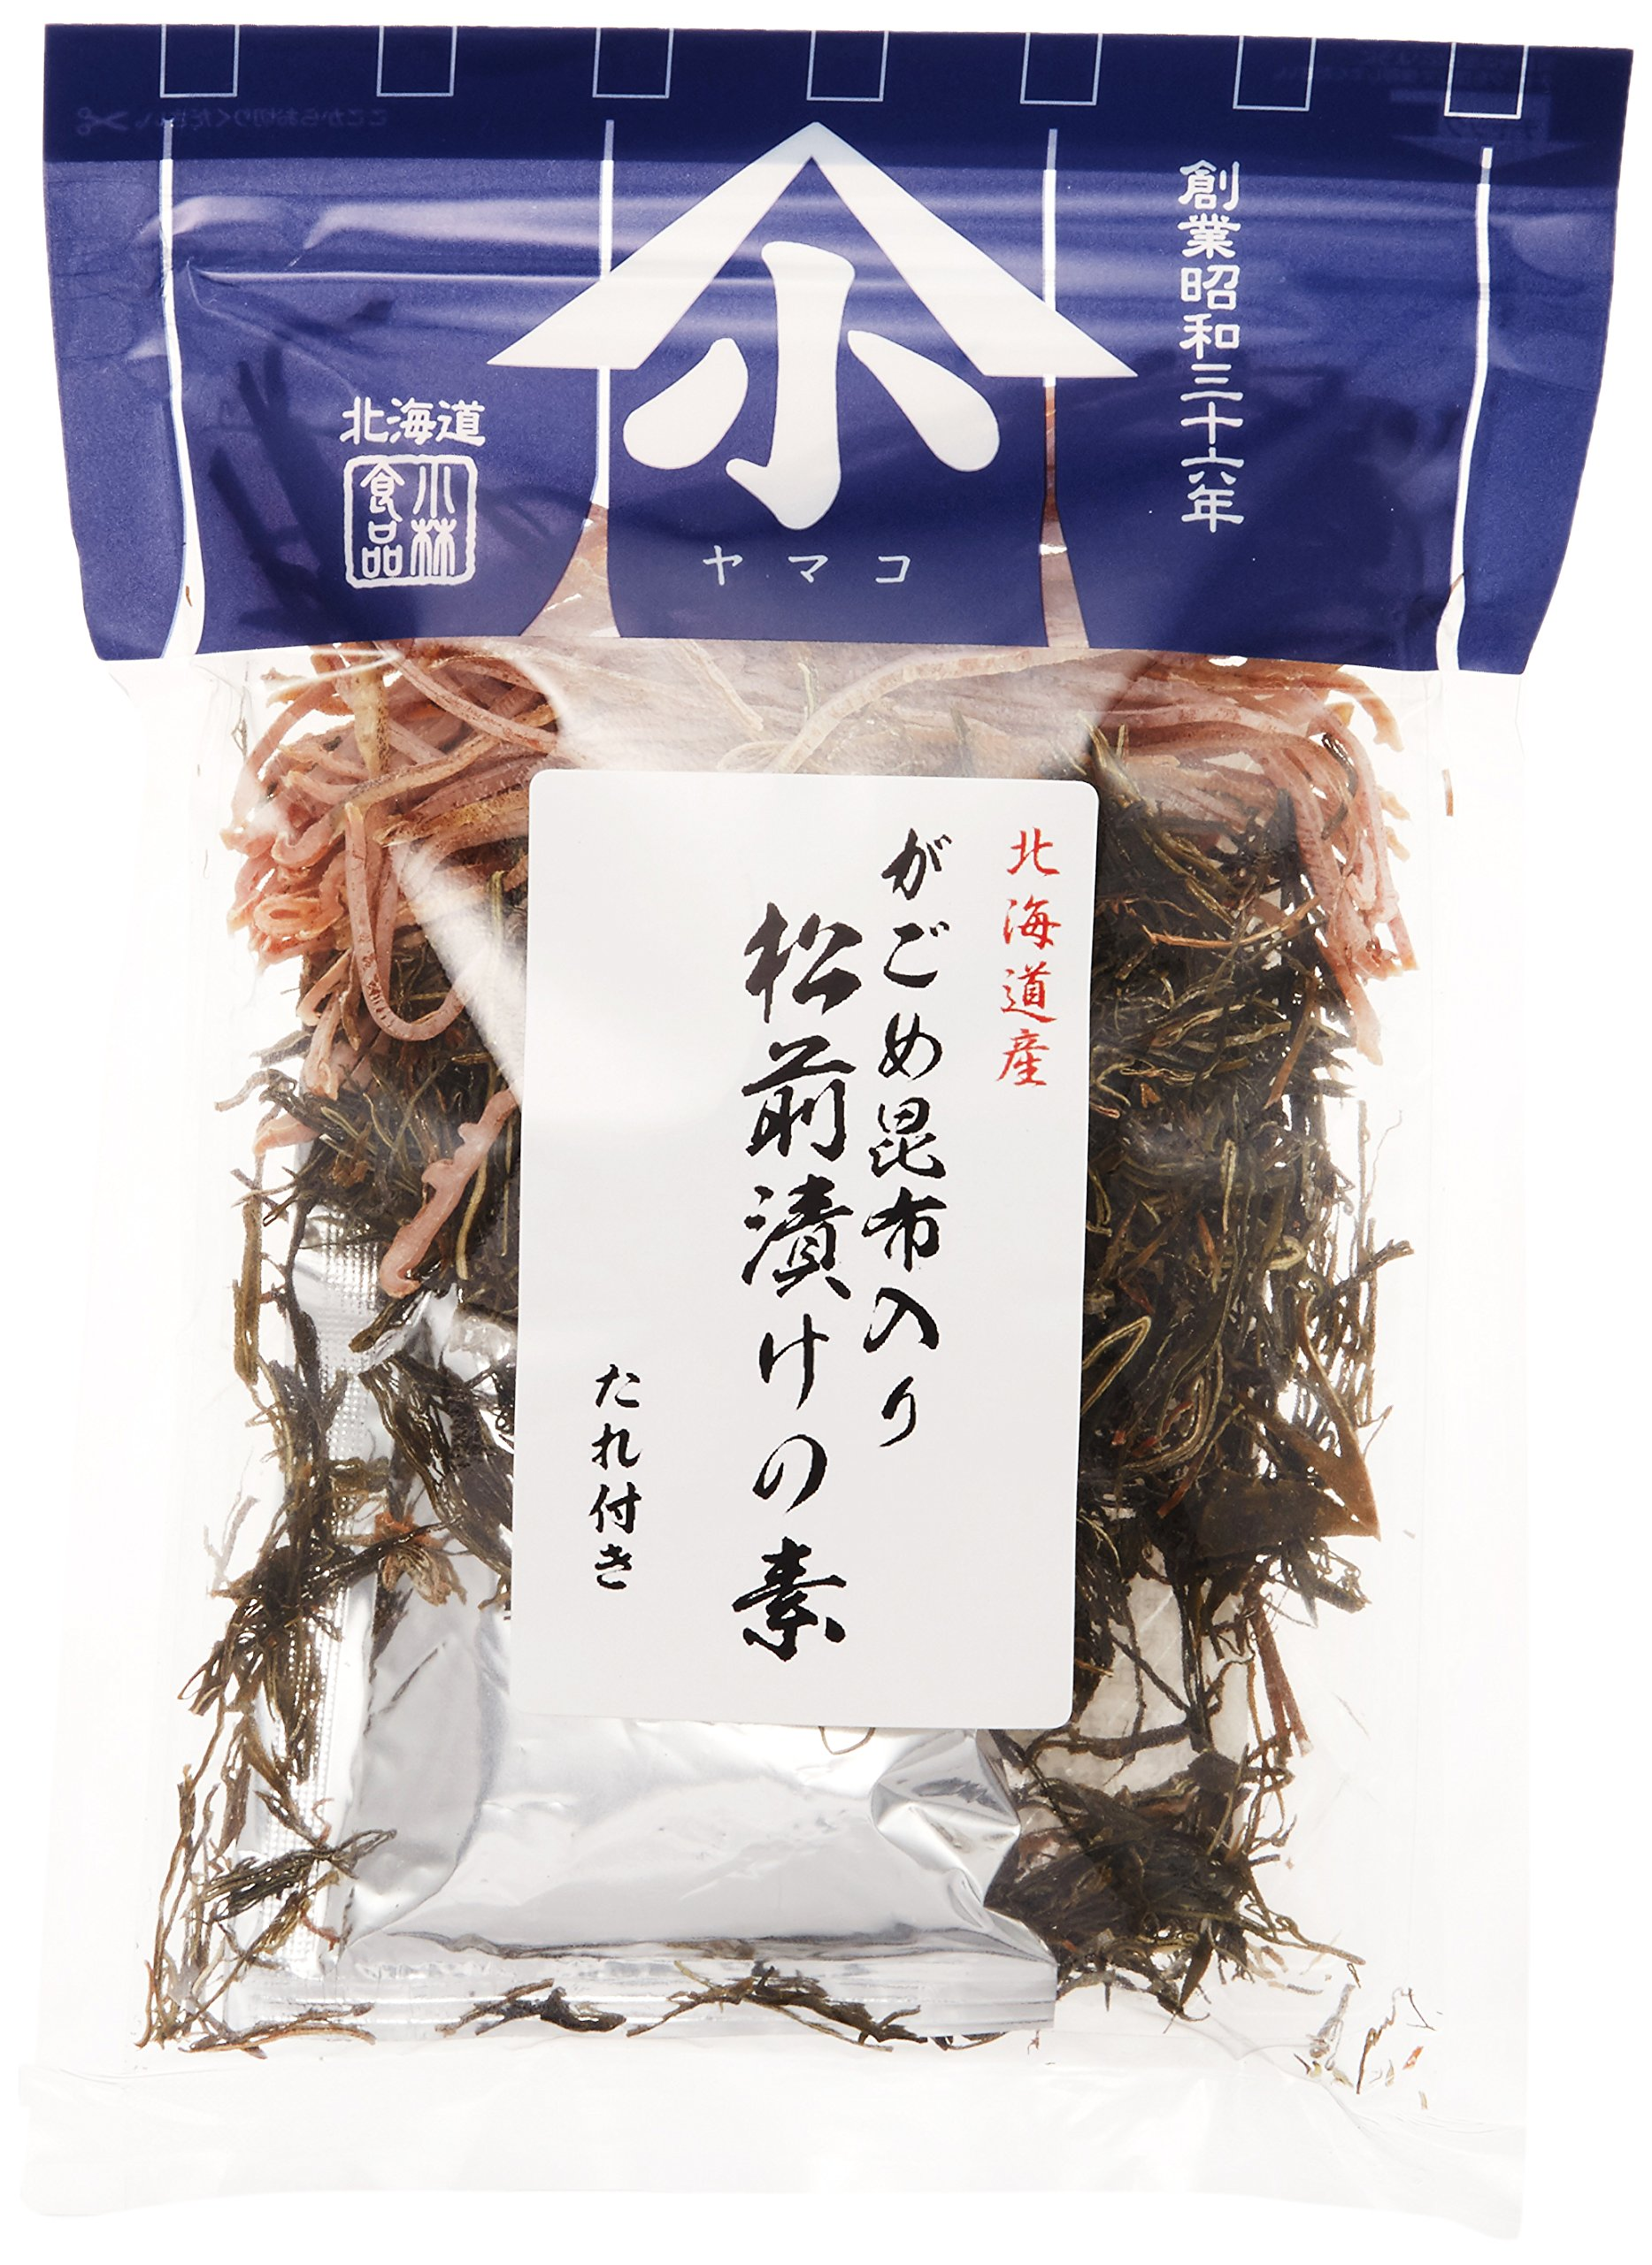 100gx5 one element of Kobayashi food mountain kelp-filled matsumaezuke by Small mountain Kobayashi food